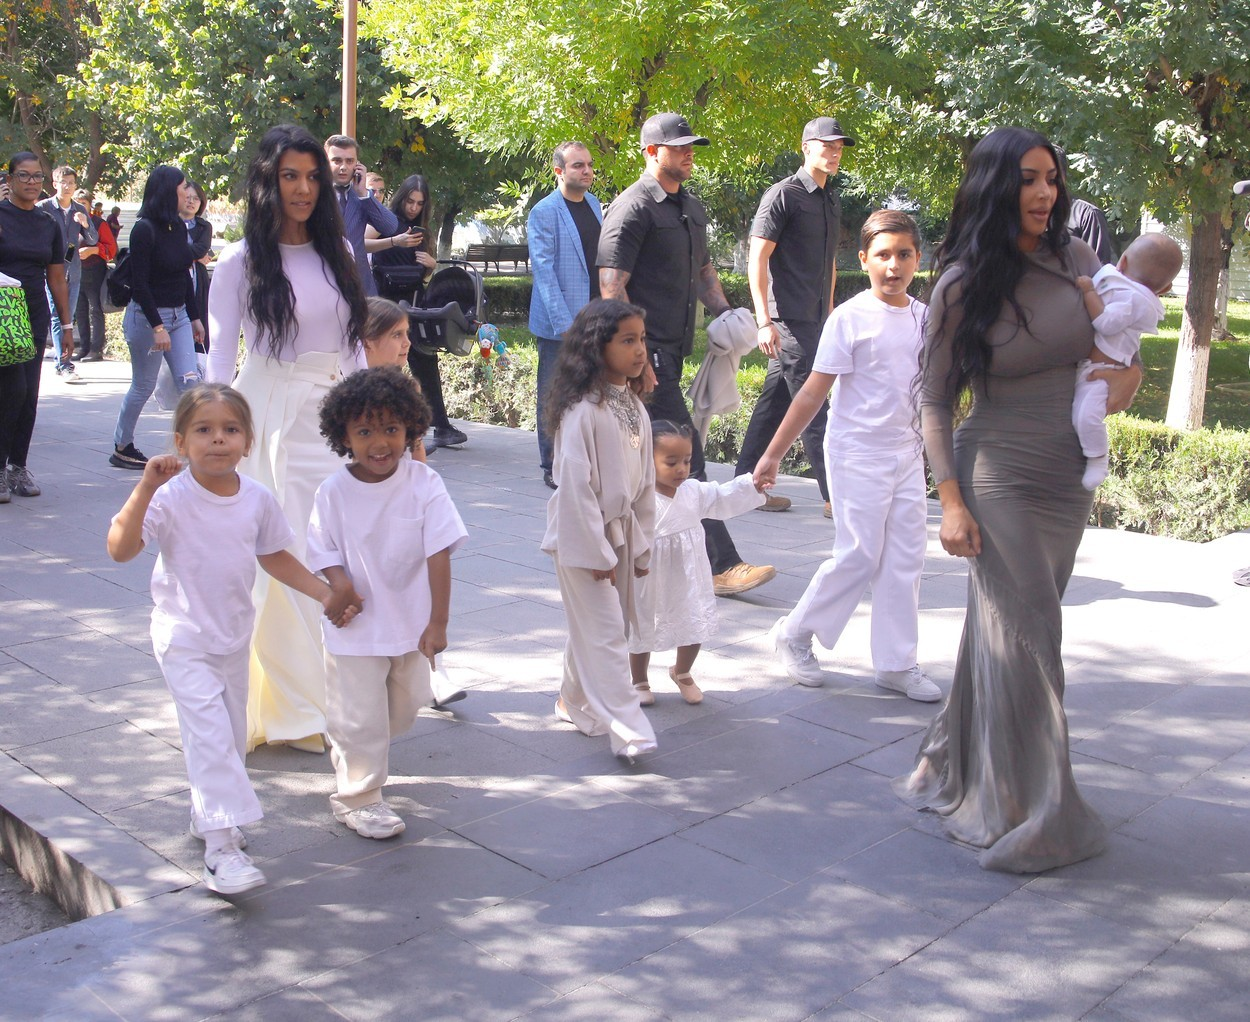 Imagini de la botezul copiilor lui Kim Kardashian din Armenia